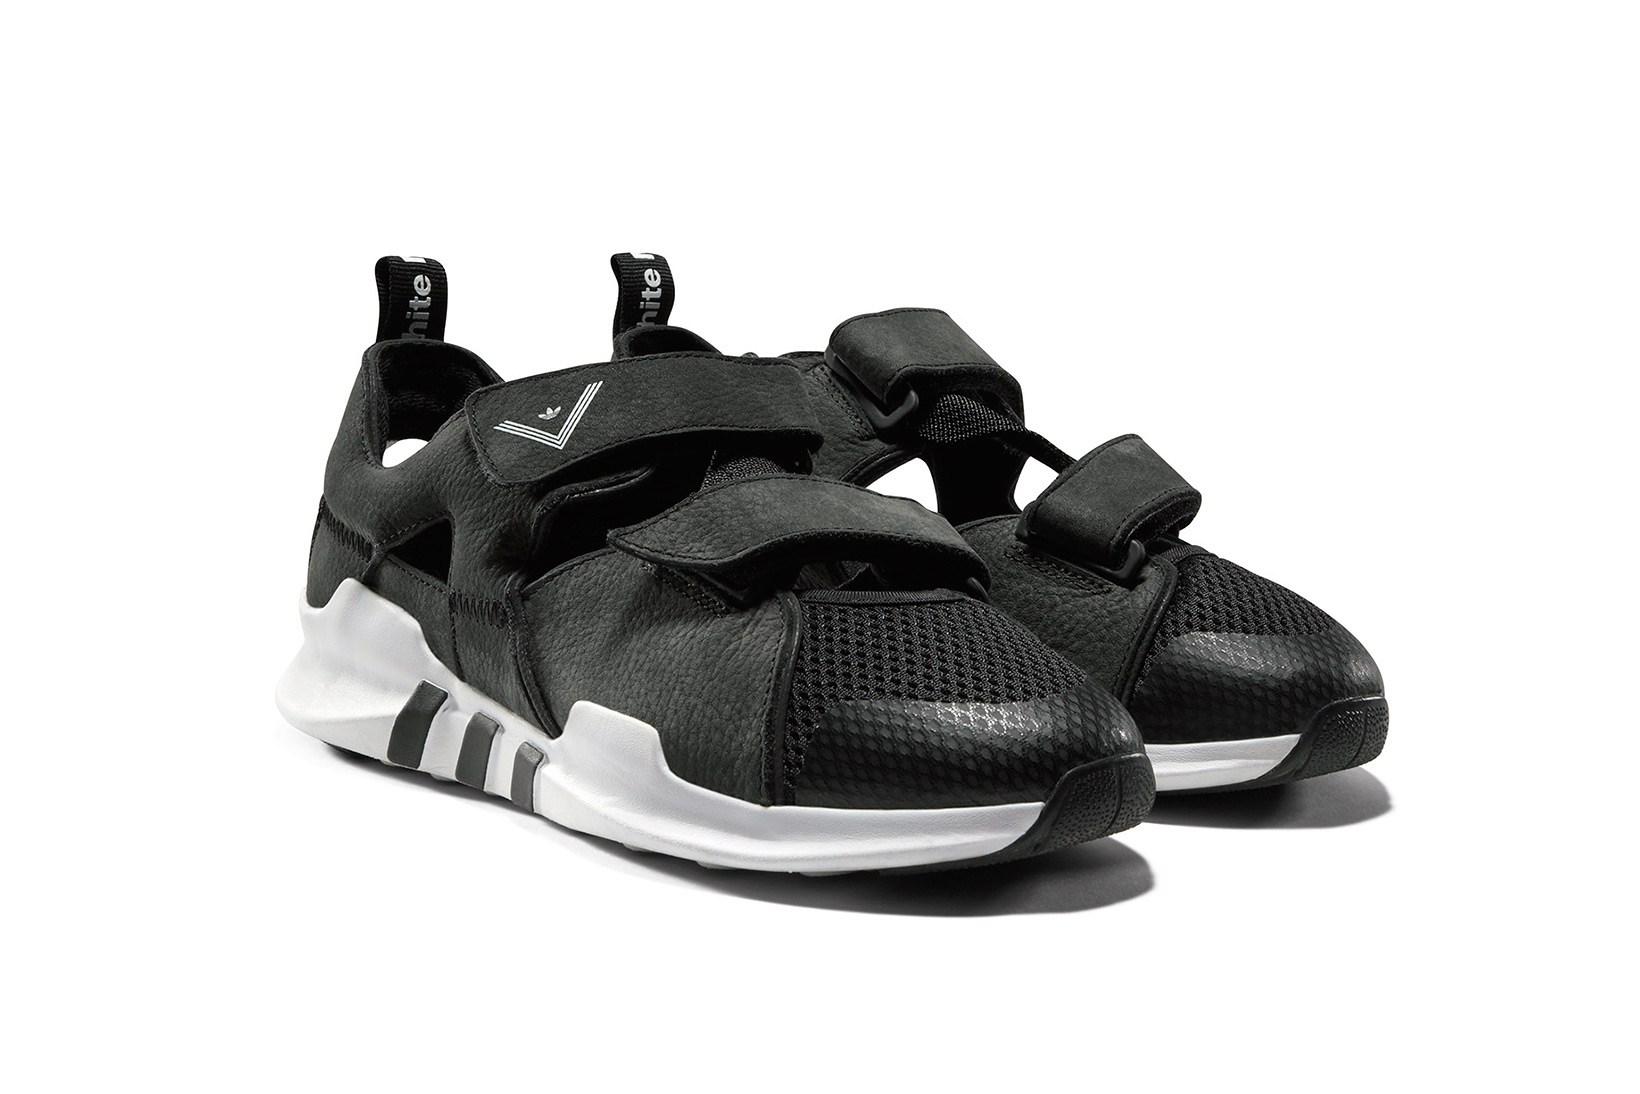 white-mountaineering-adidas-originals-closer-look-3